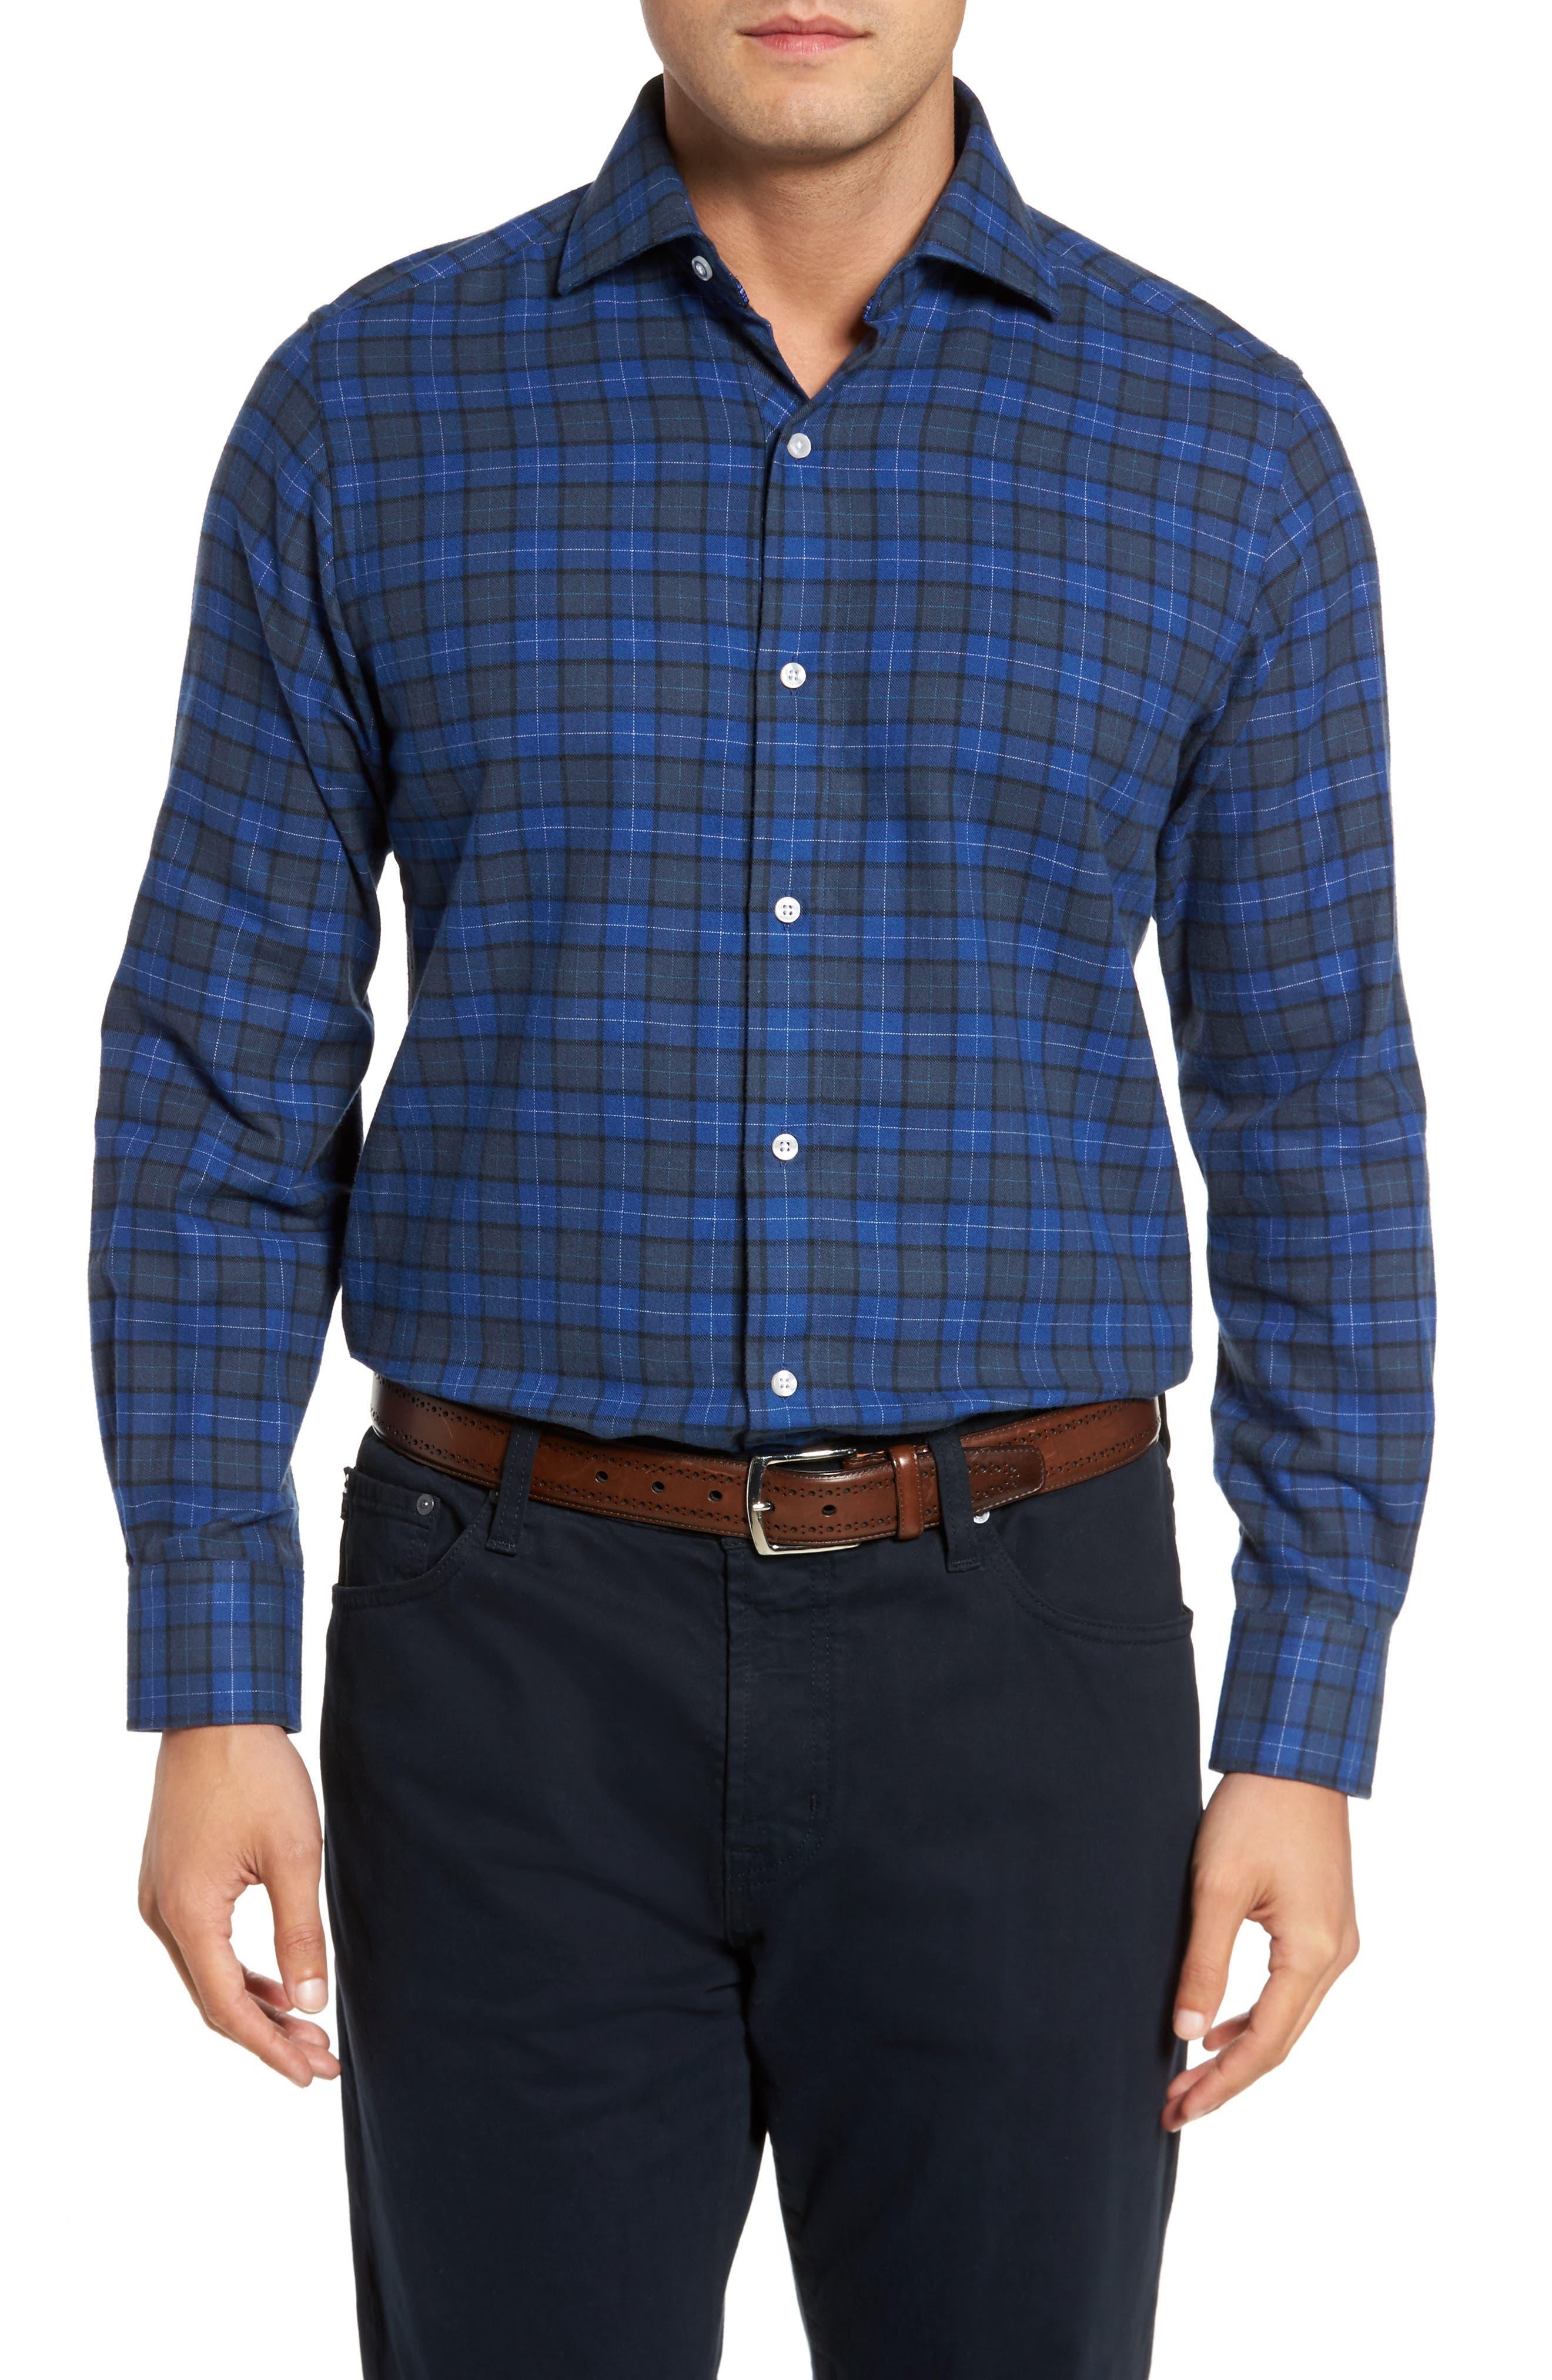 Cankton Plaid Sport Shirt,                             Main thumbnail 1, color,                             400